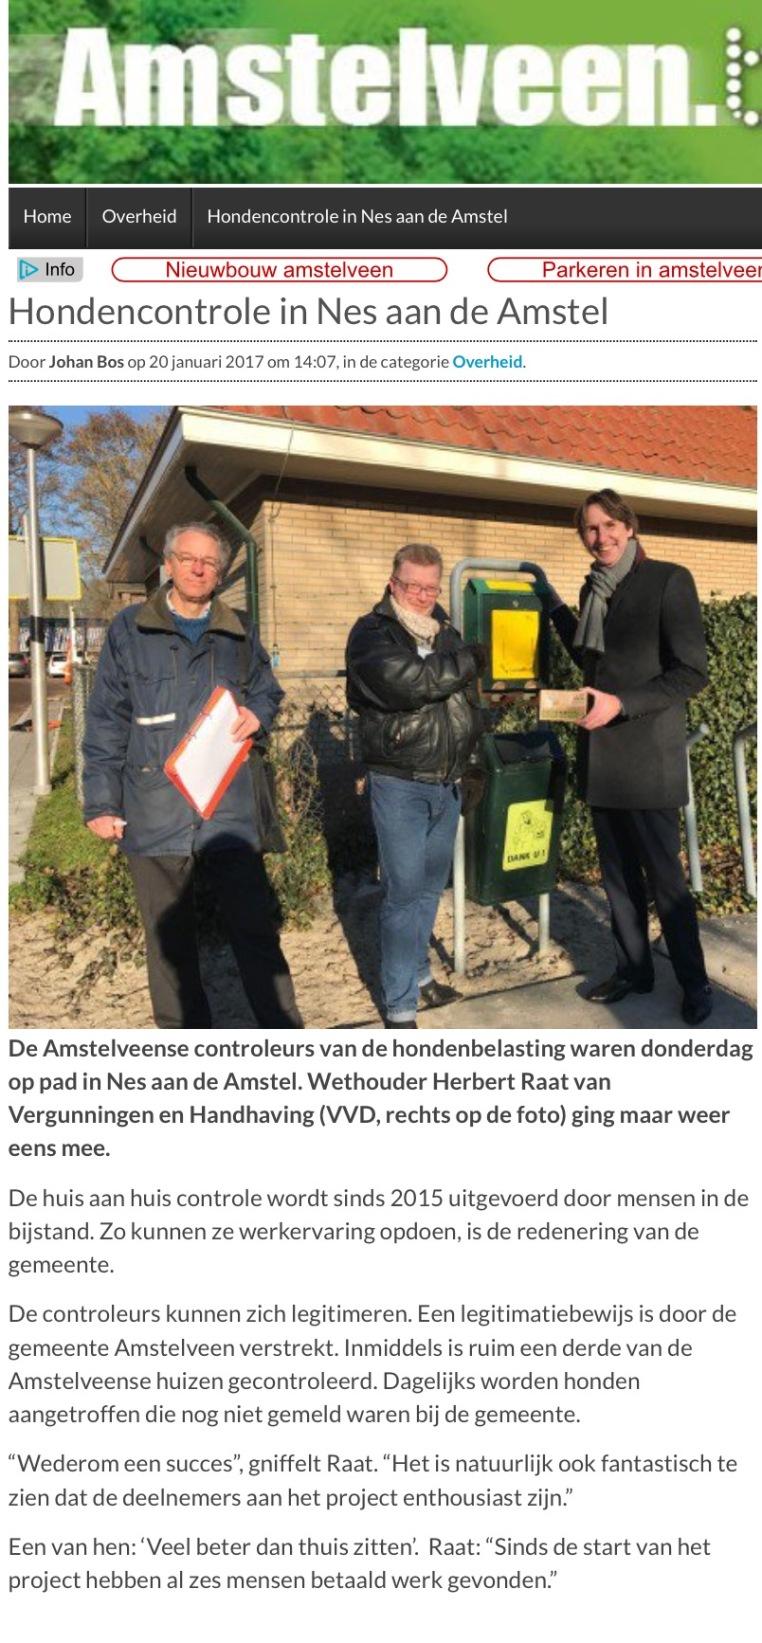 2017-20-1 AmstelveenBlog.nl controle hondenbelasting